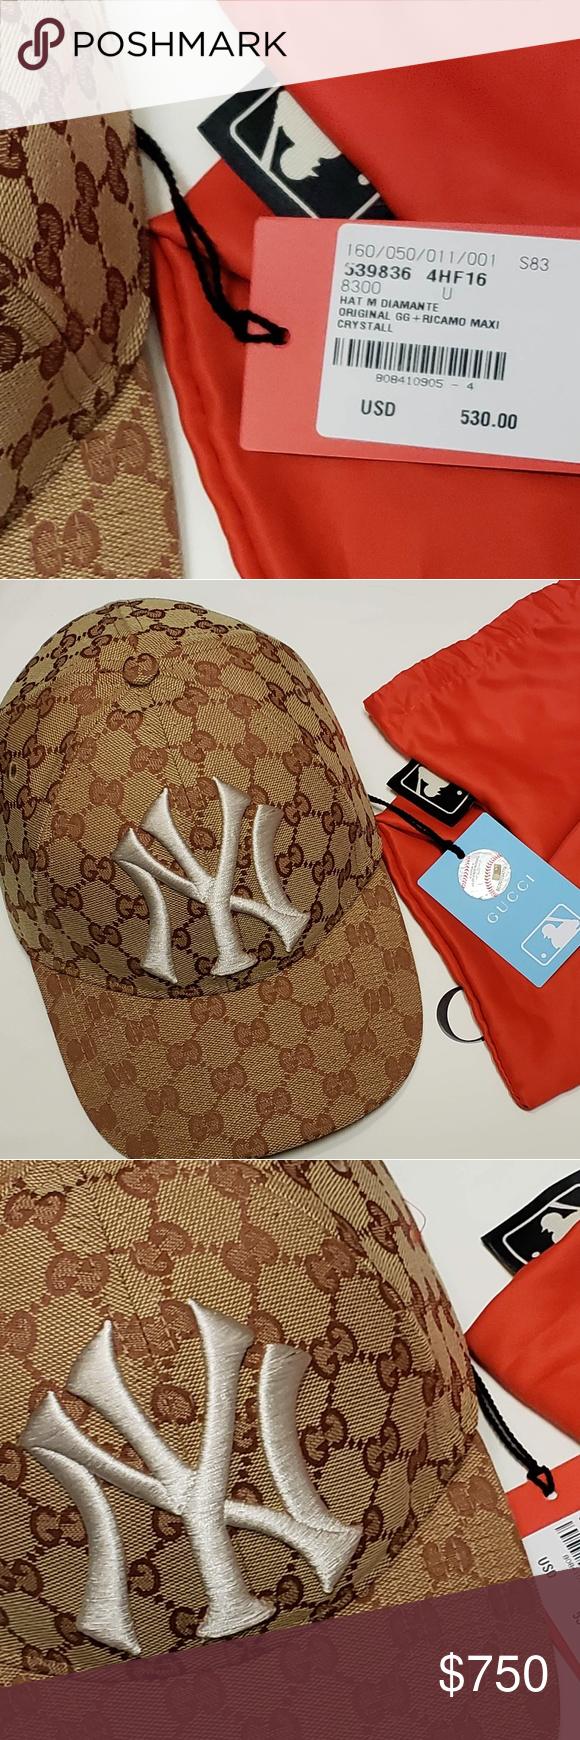 7b2c88b191b9b 🔥🔥Exclusive Gucci NY Yankees Cap NEW 🔥🔥 Gucci NY YANKEES MLB baseball  cap Authentic